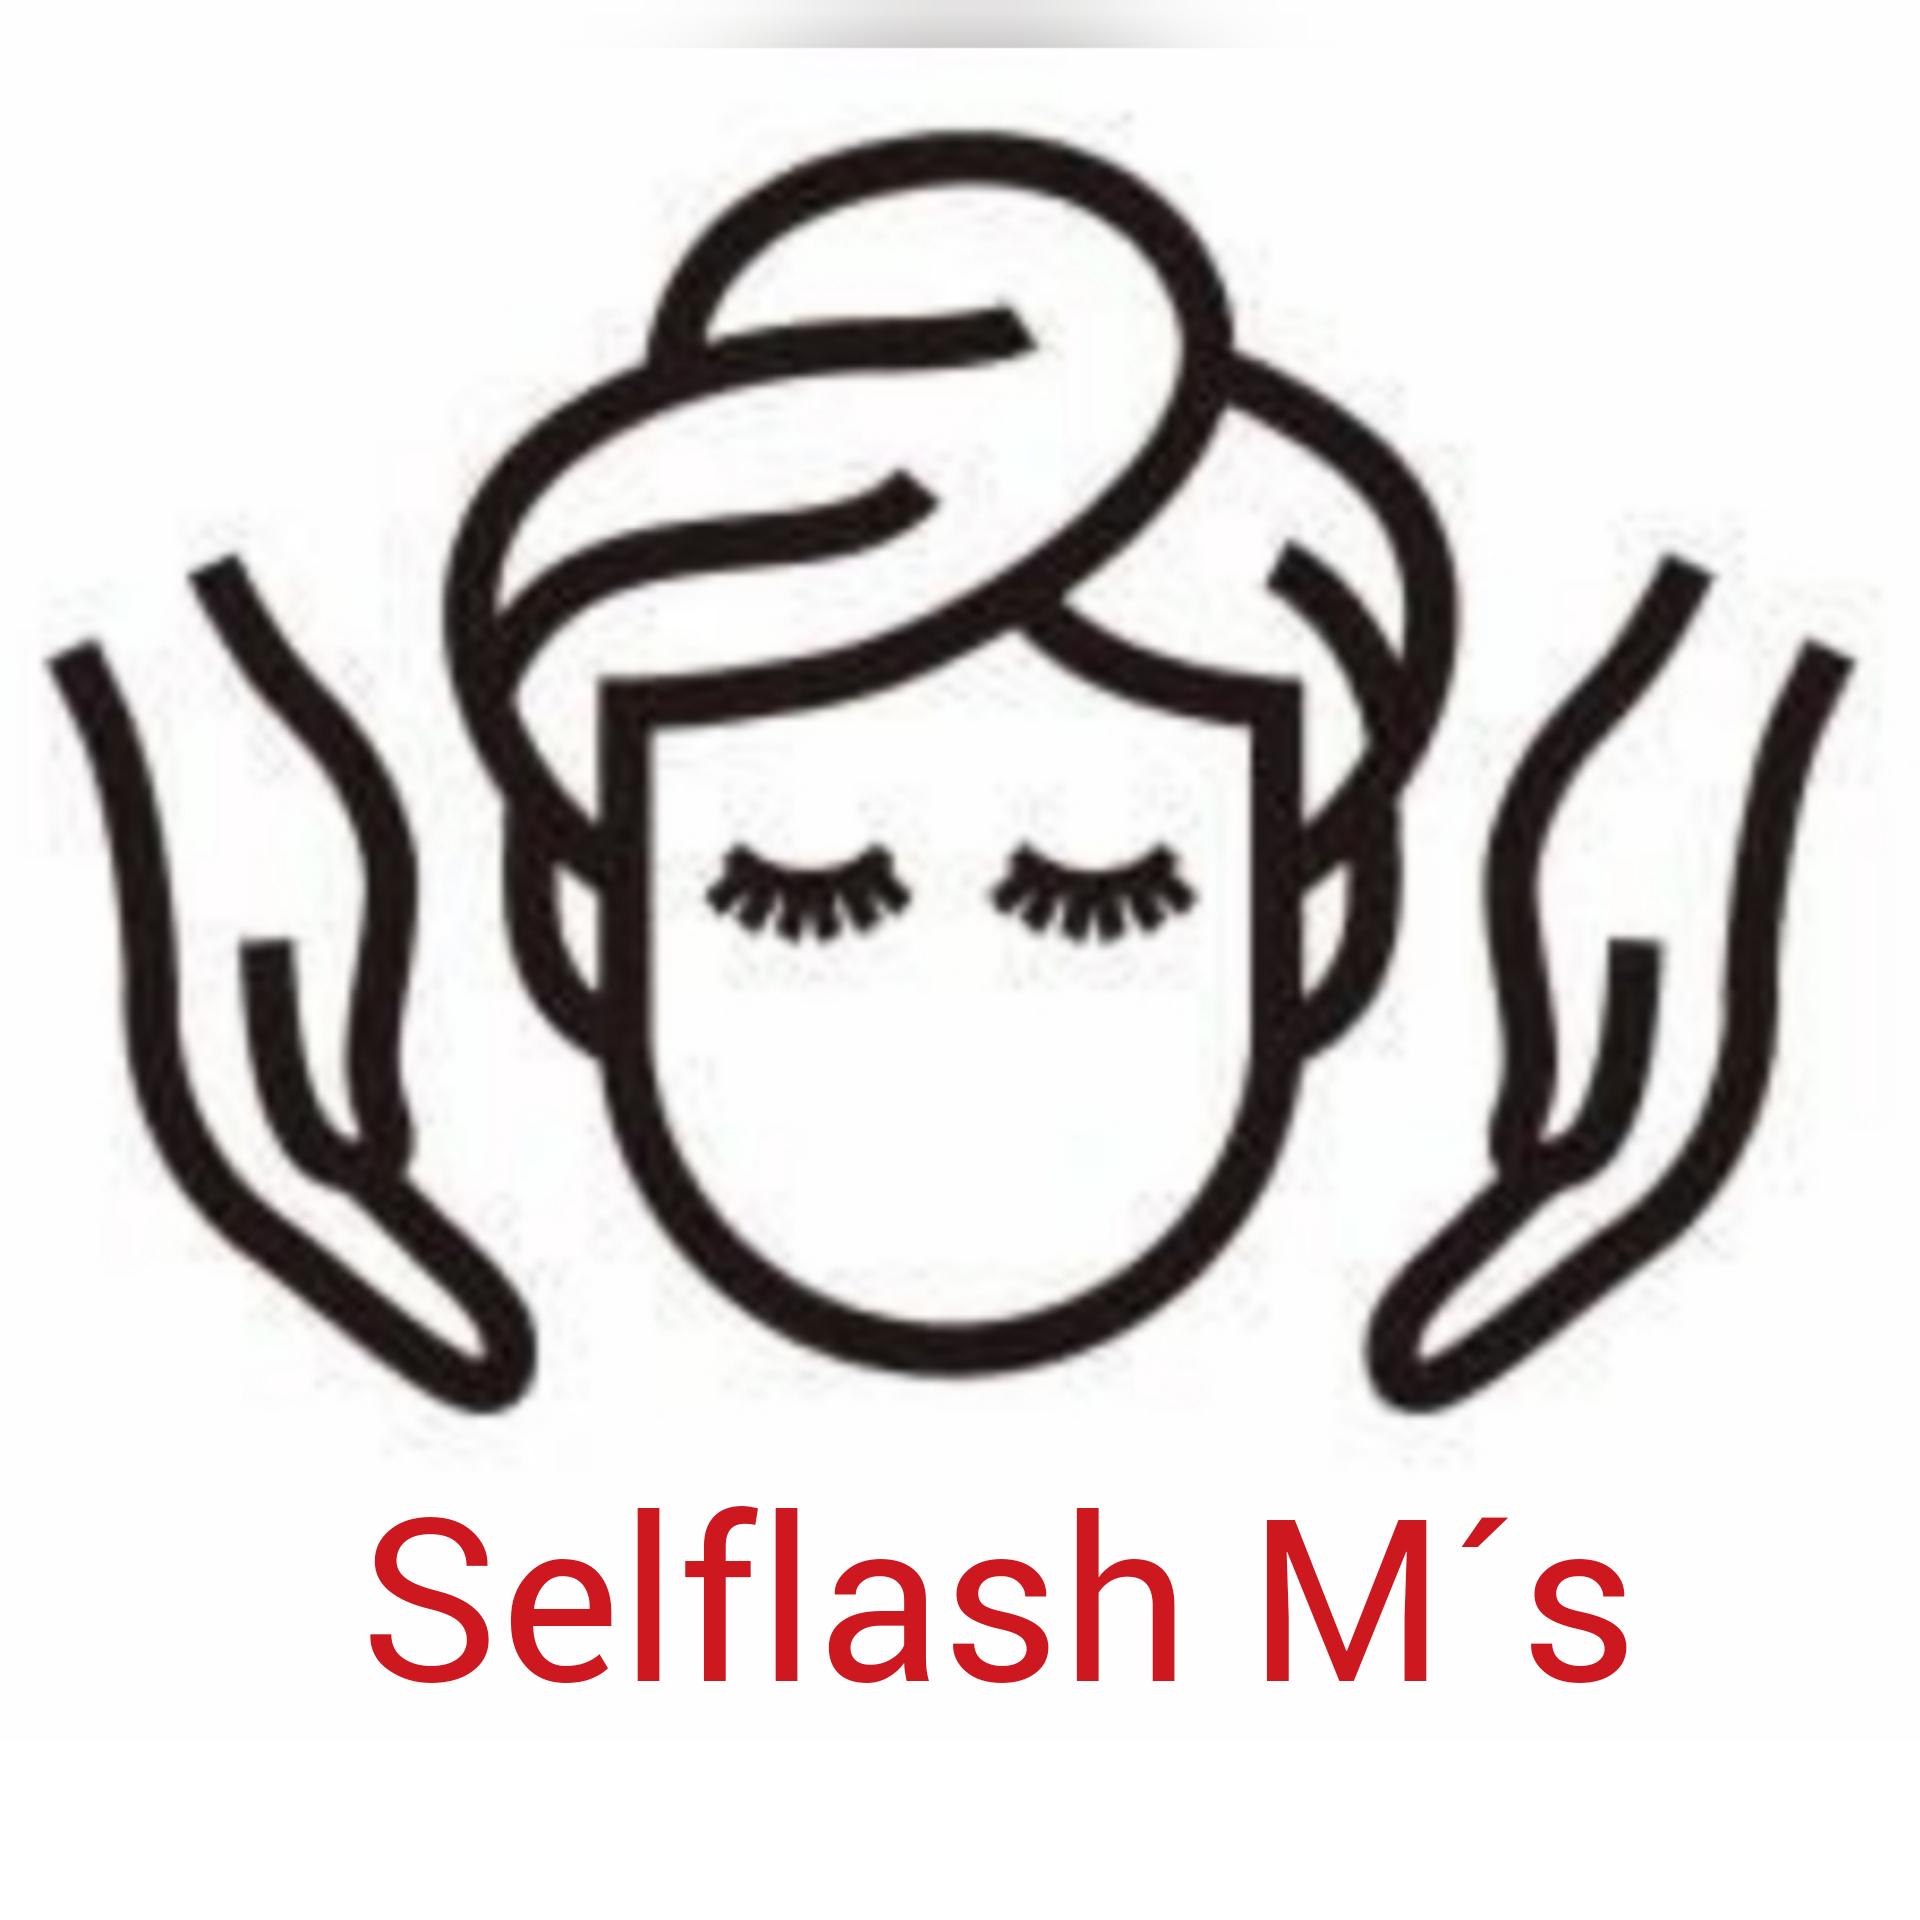 selflash Ms(セルフラッシュ エムズ)